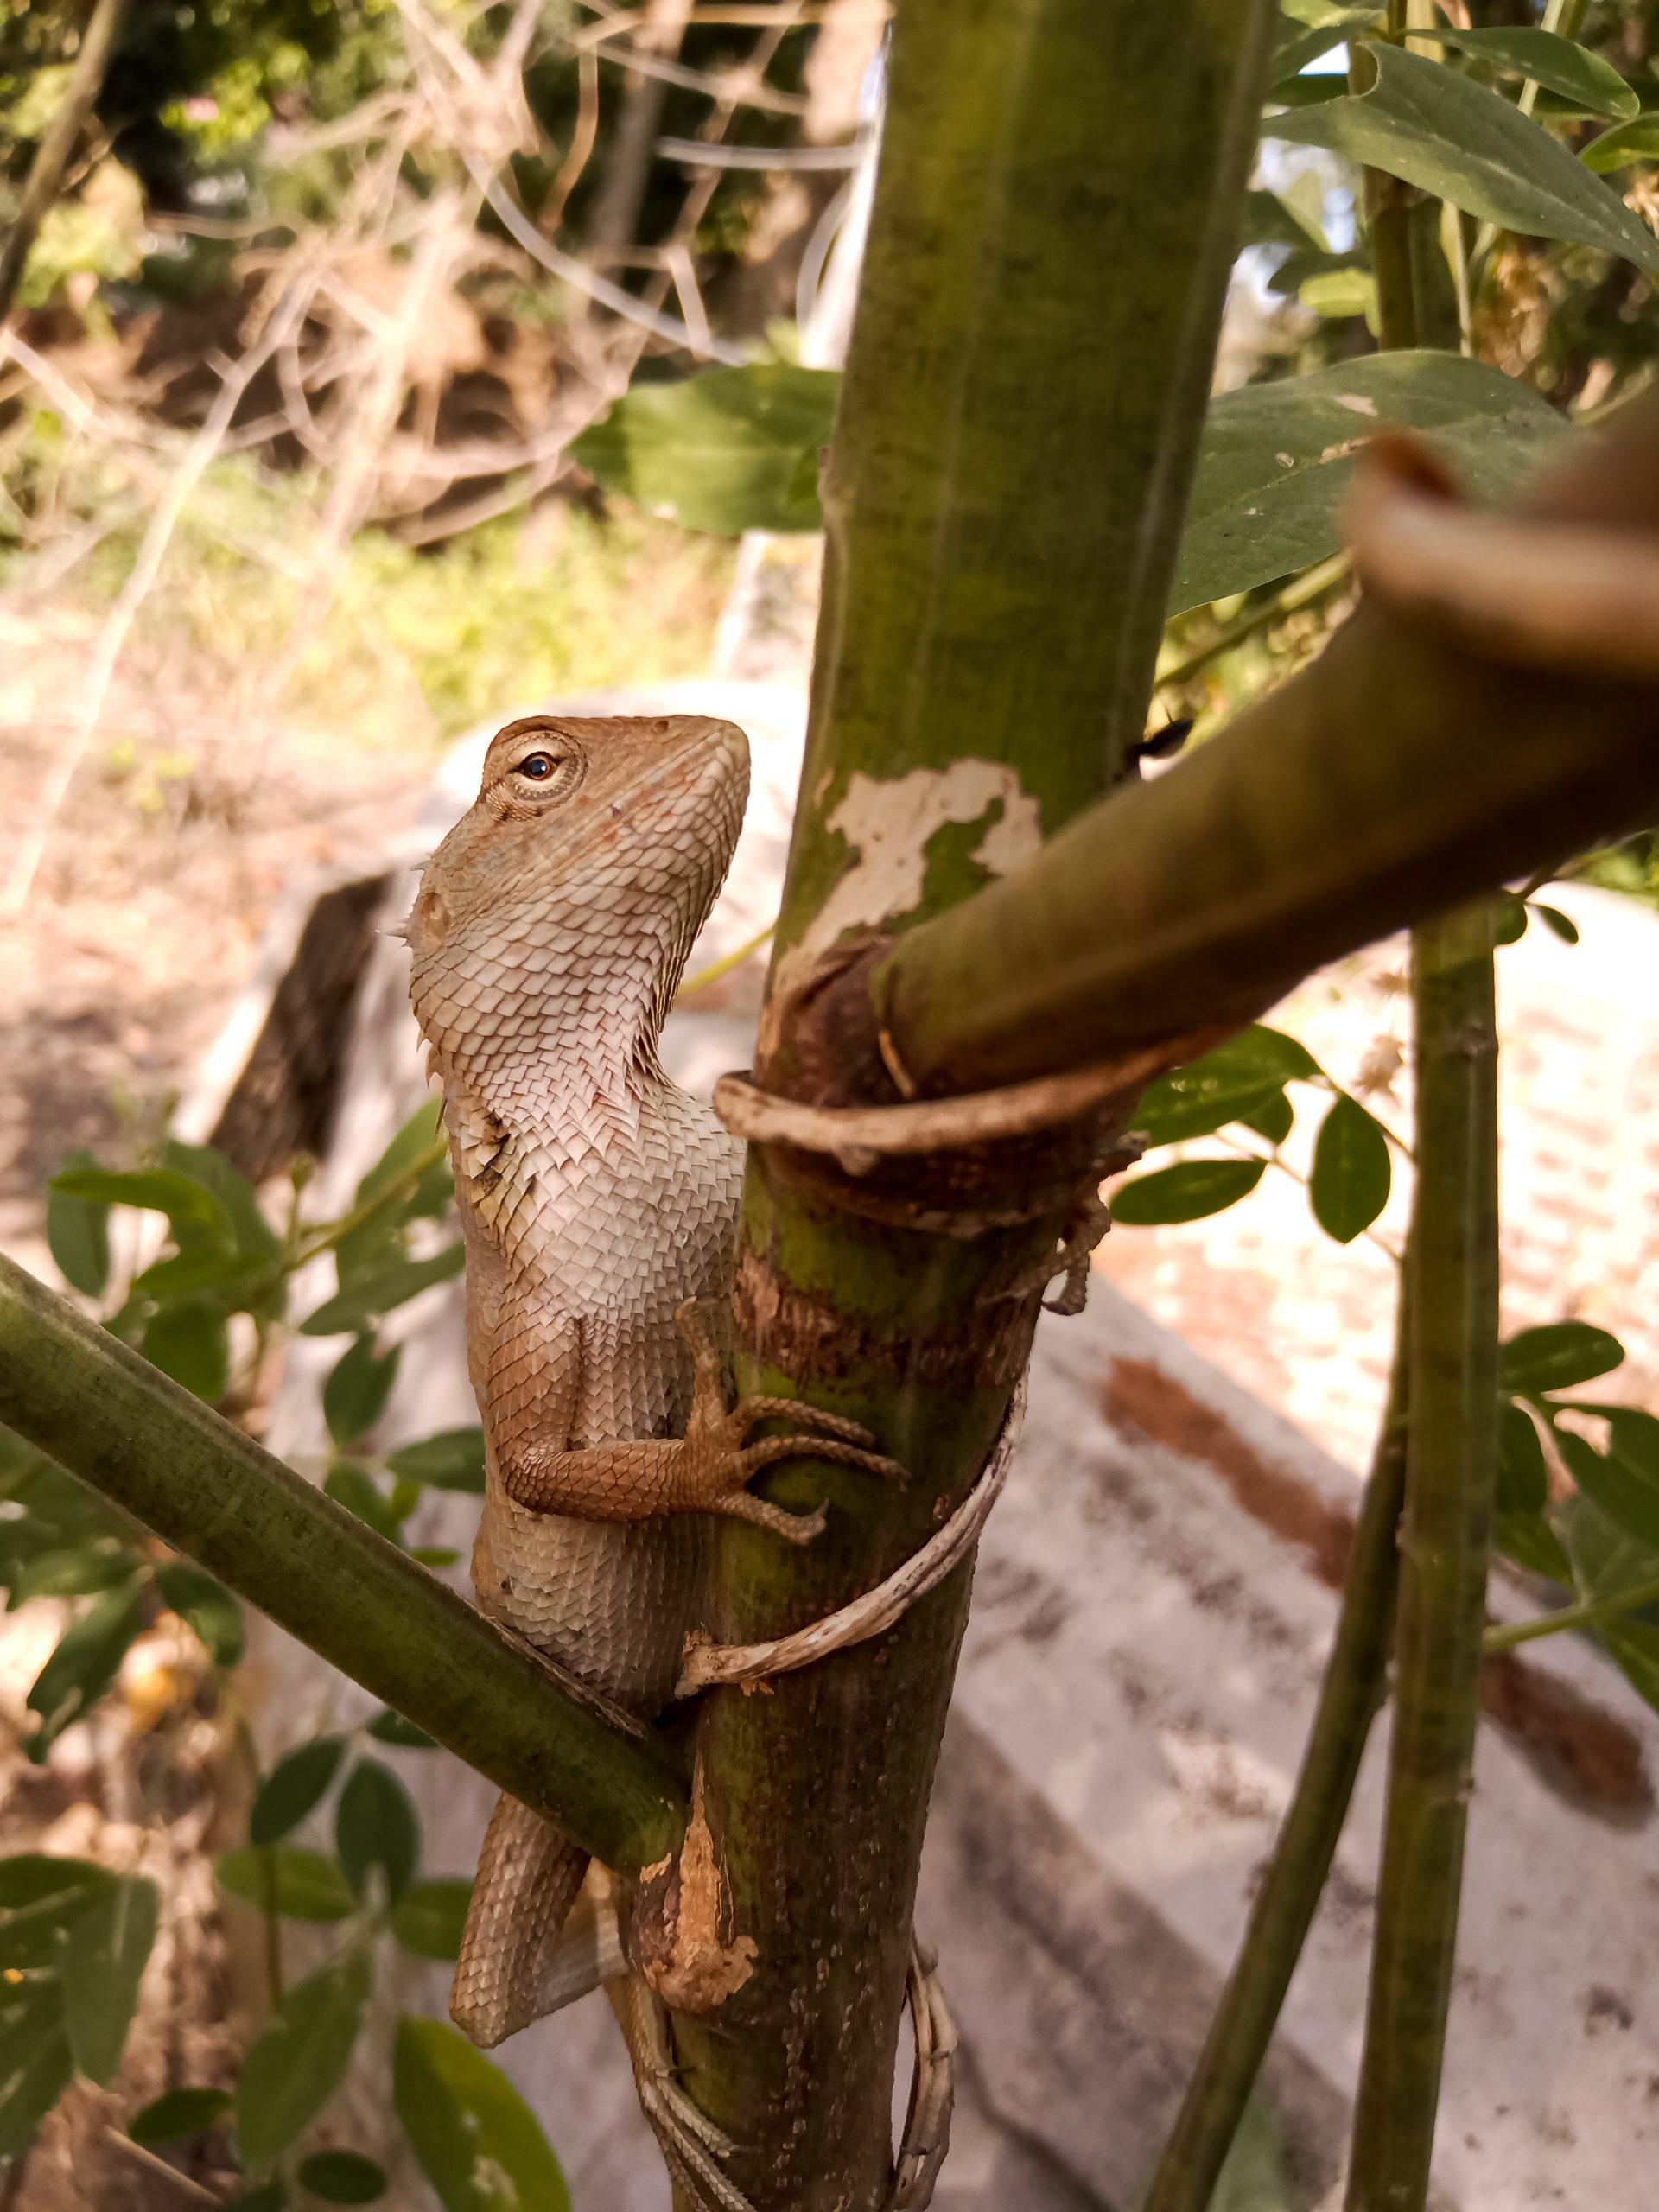 A chameleon on a plant